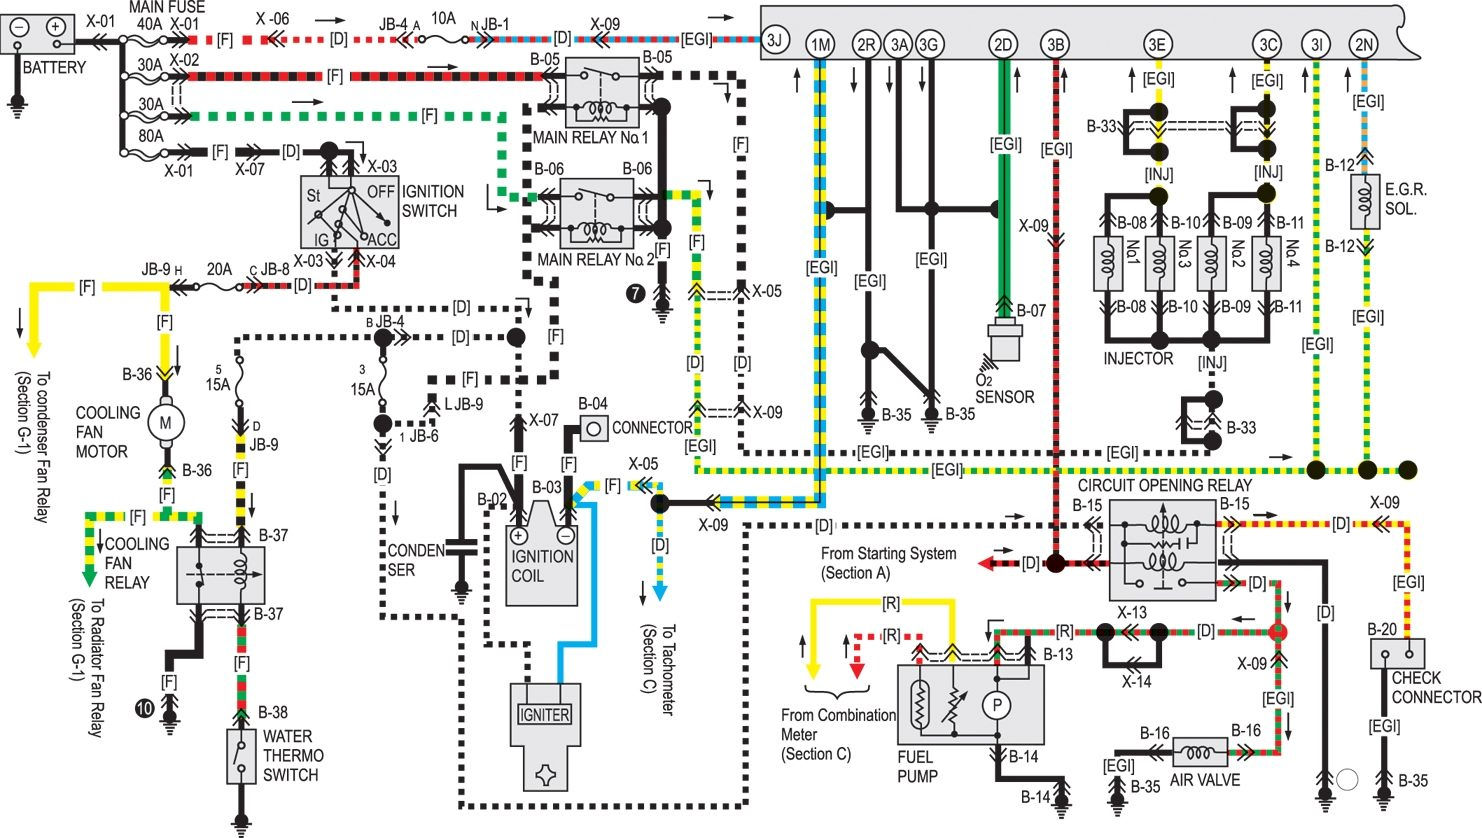 2002 Mazda Protege Fuse Diagram Wiring Library 323 Box Layout 626 Gd Circuit Symbols U2022 1999